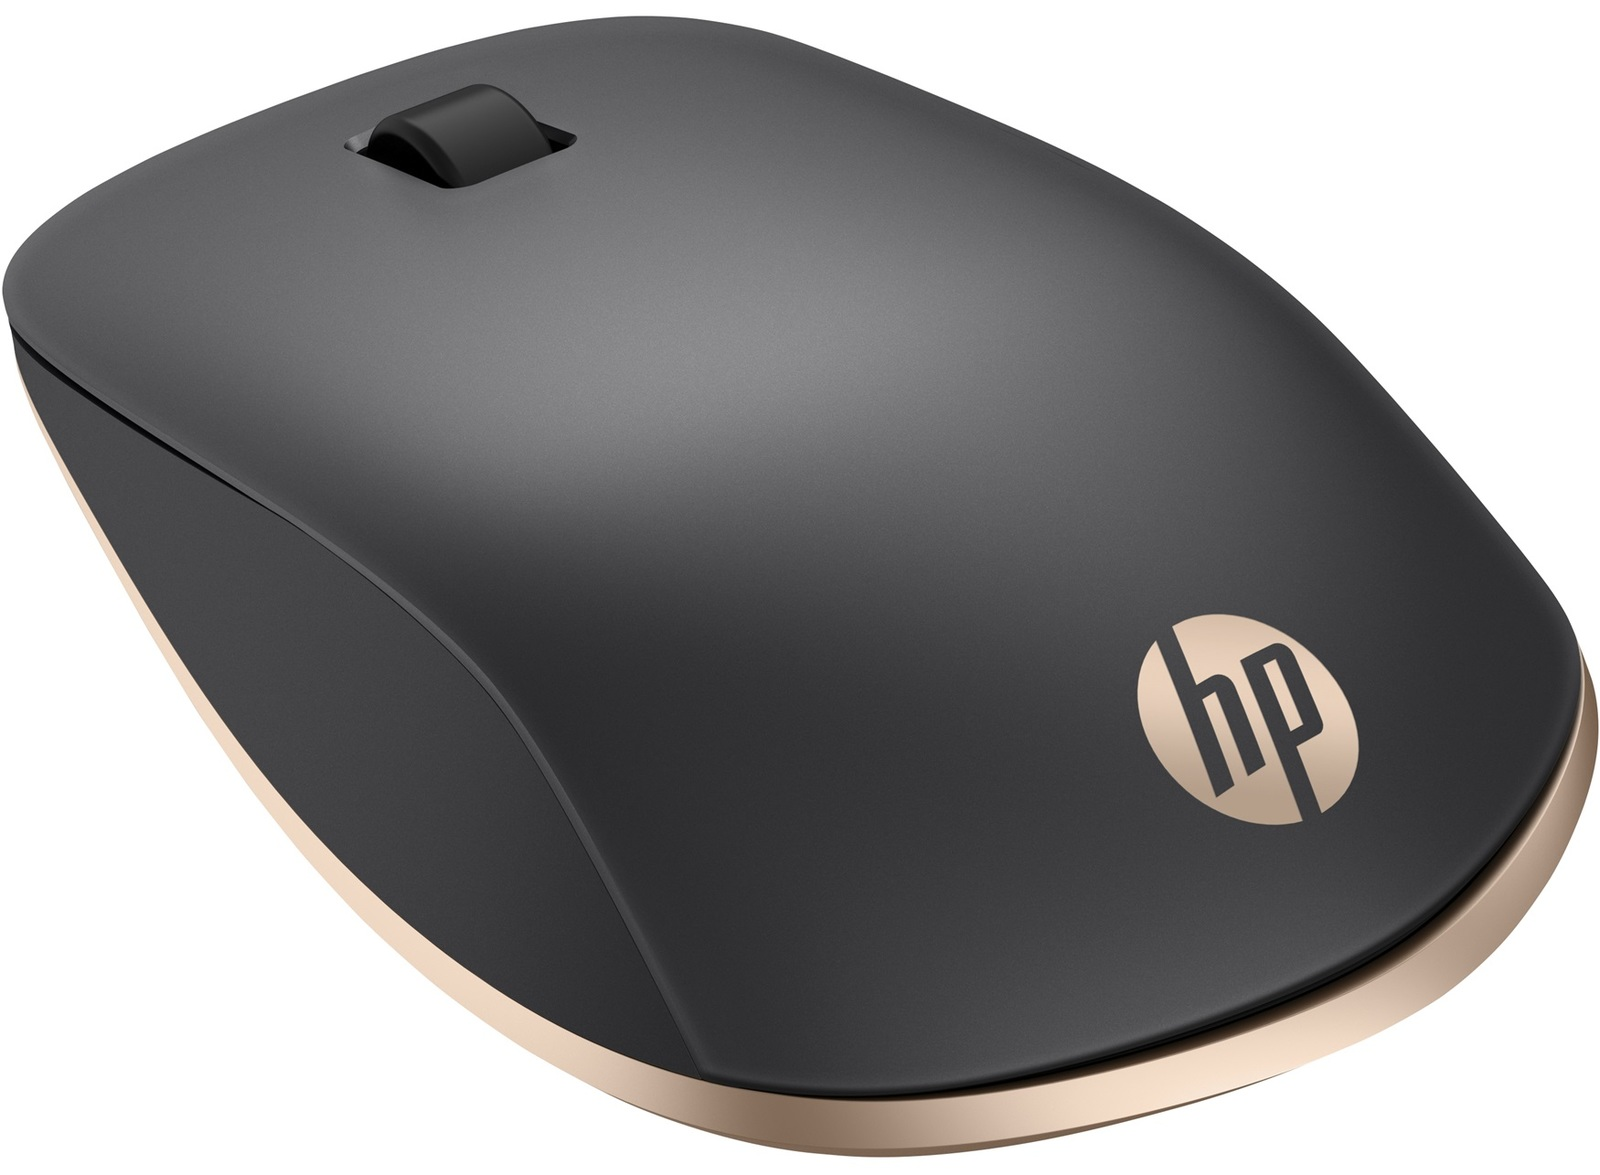 HP Z5000 Bluetooth Mouse (Dark Ash)